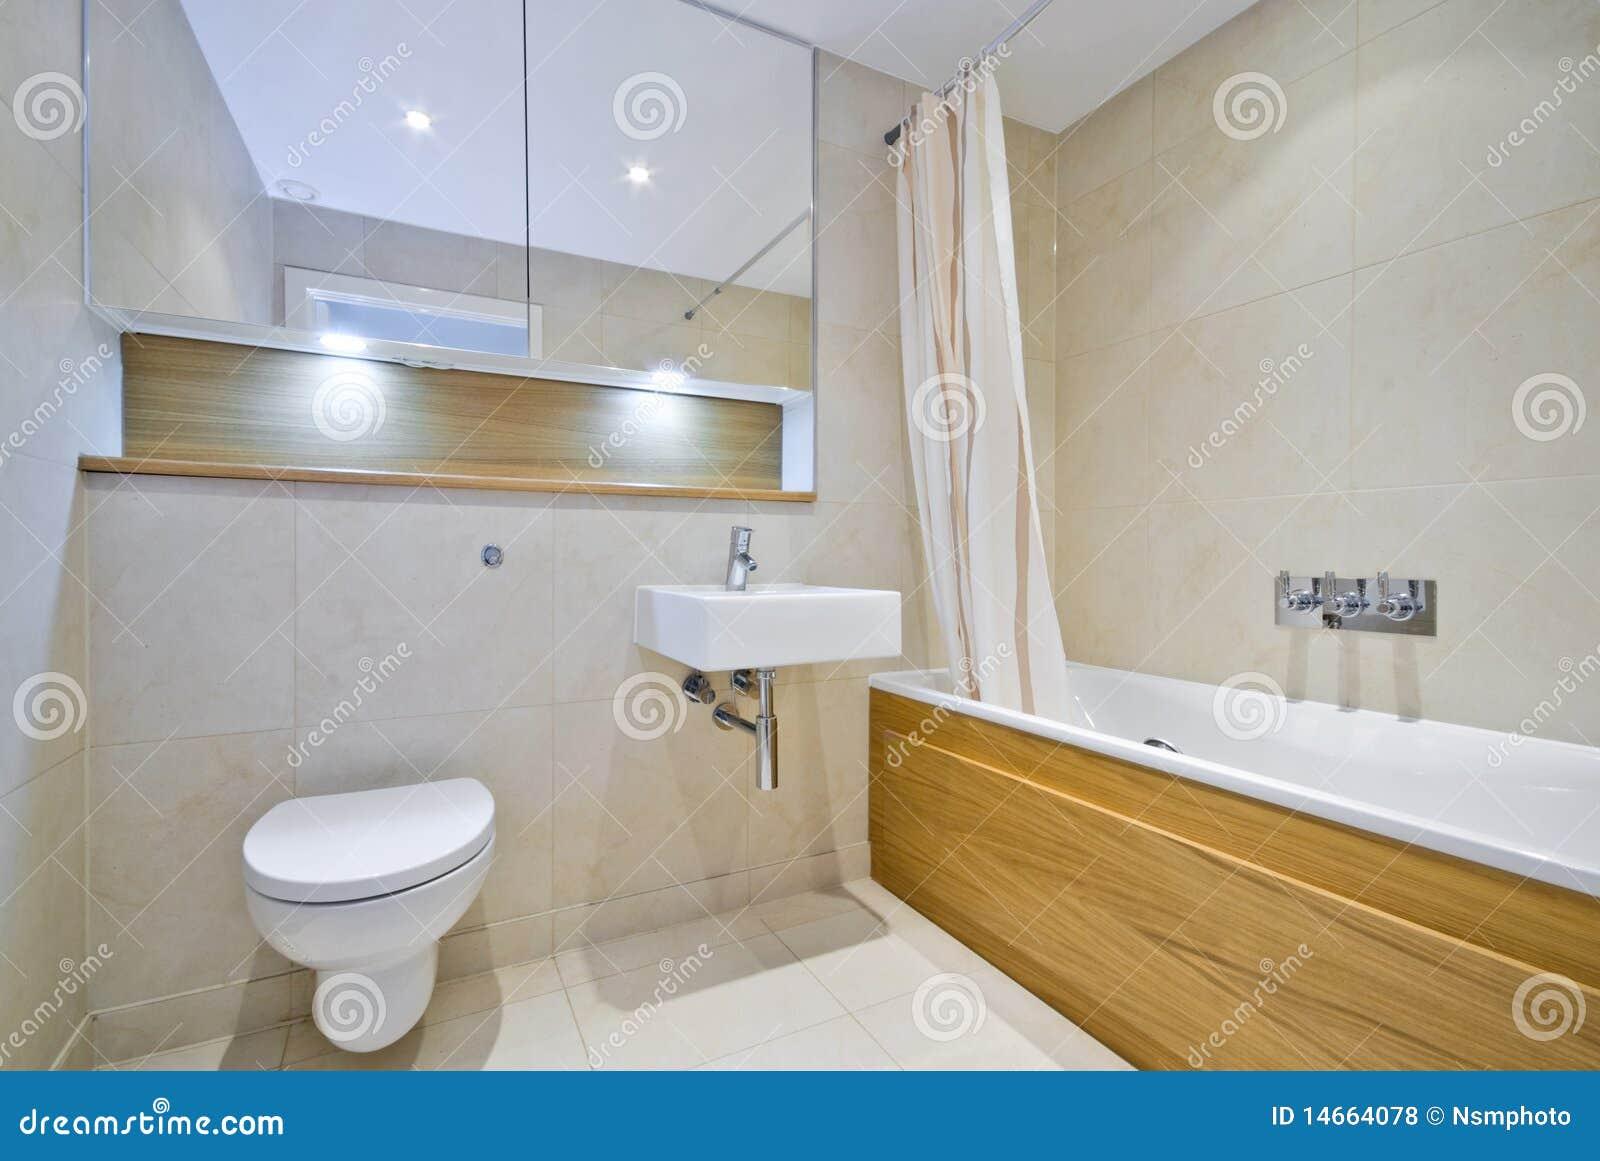 Moderne badkamers met grote badton in beige royalty vrije stock foto 39 s beeld 14664078 - Bruine en beige badkamer ...